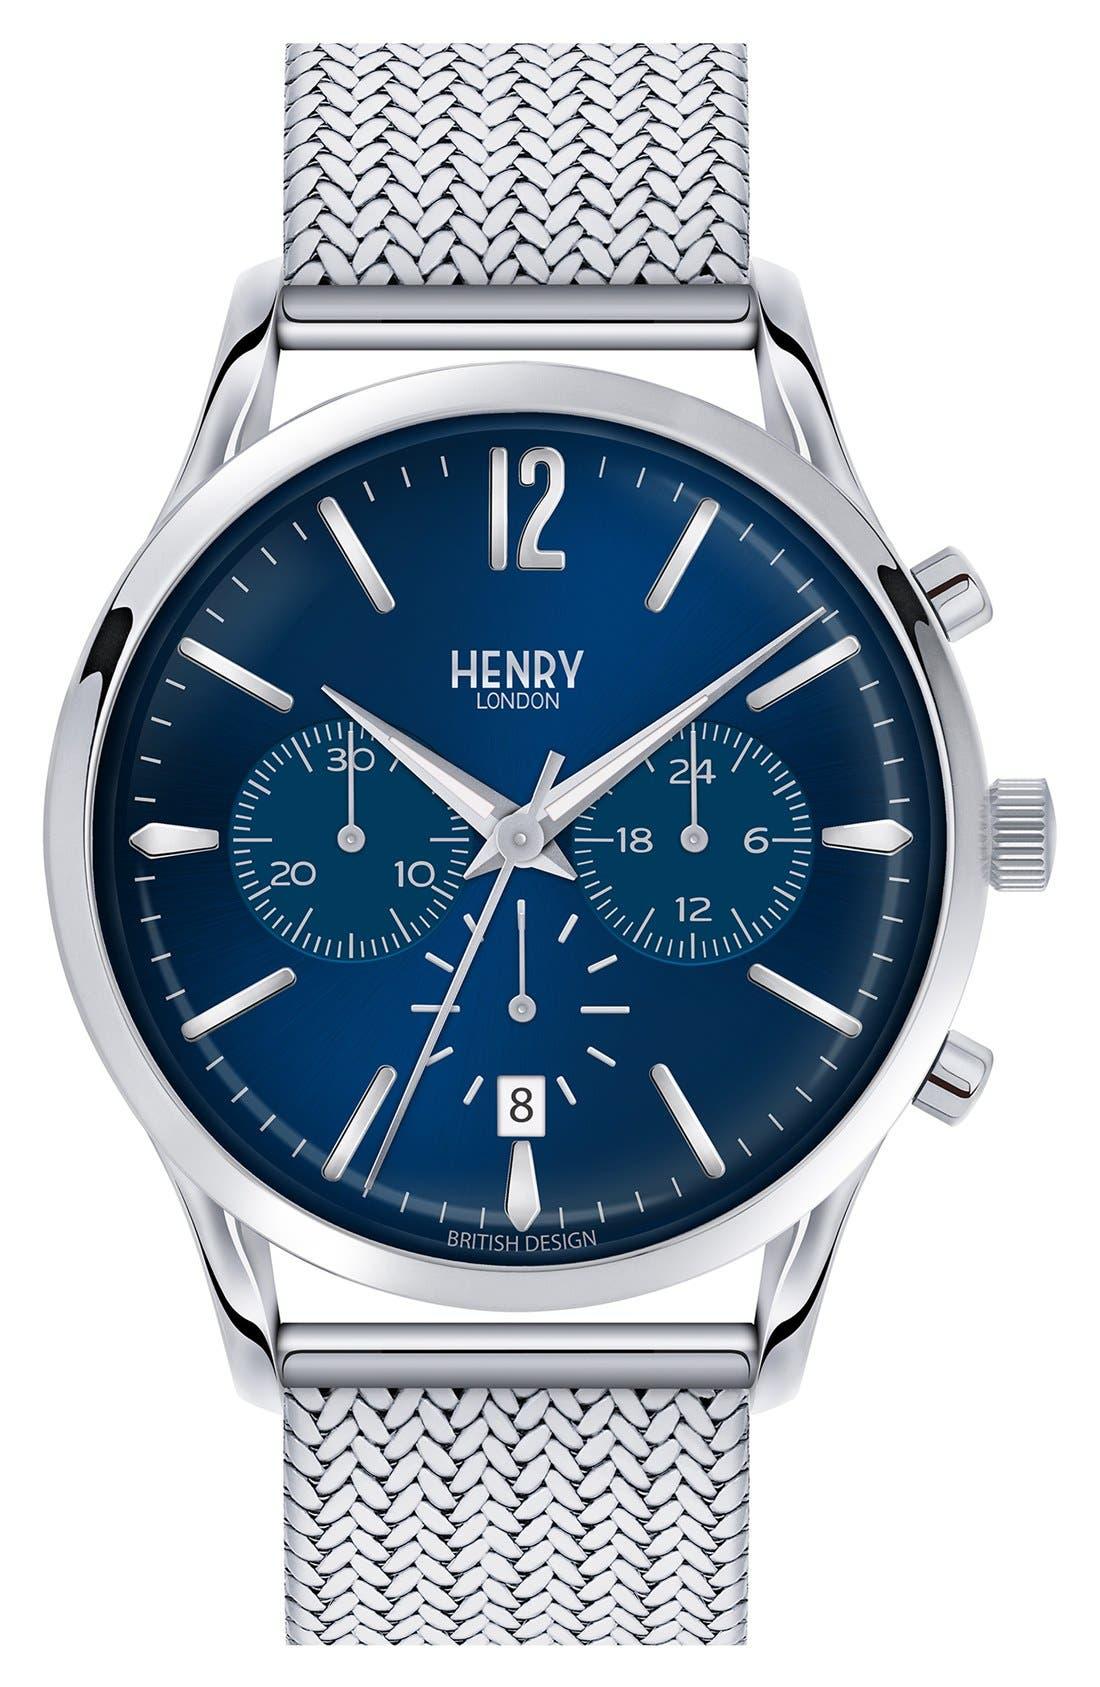 HENRY LONDON 'Knightsbridge' Chronograph Mesh Strap Watch, 38Mm in Silver/ Deep Blue